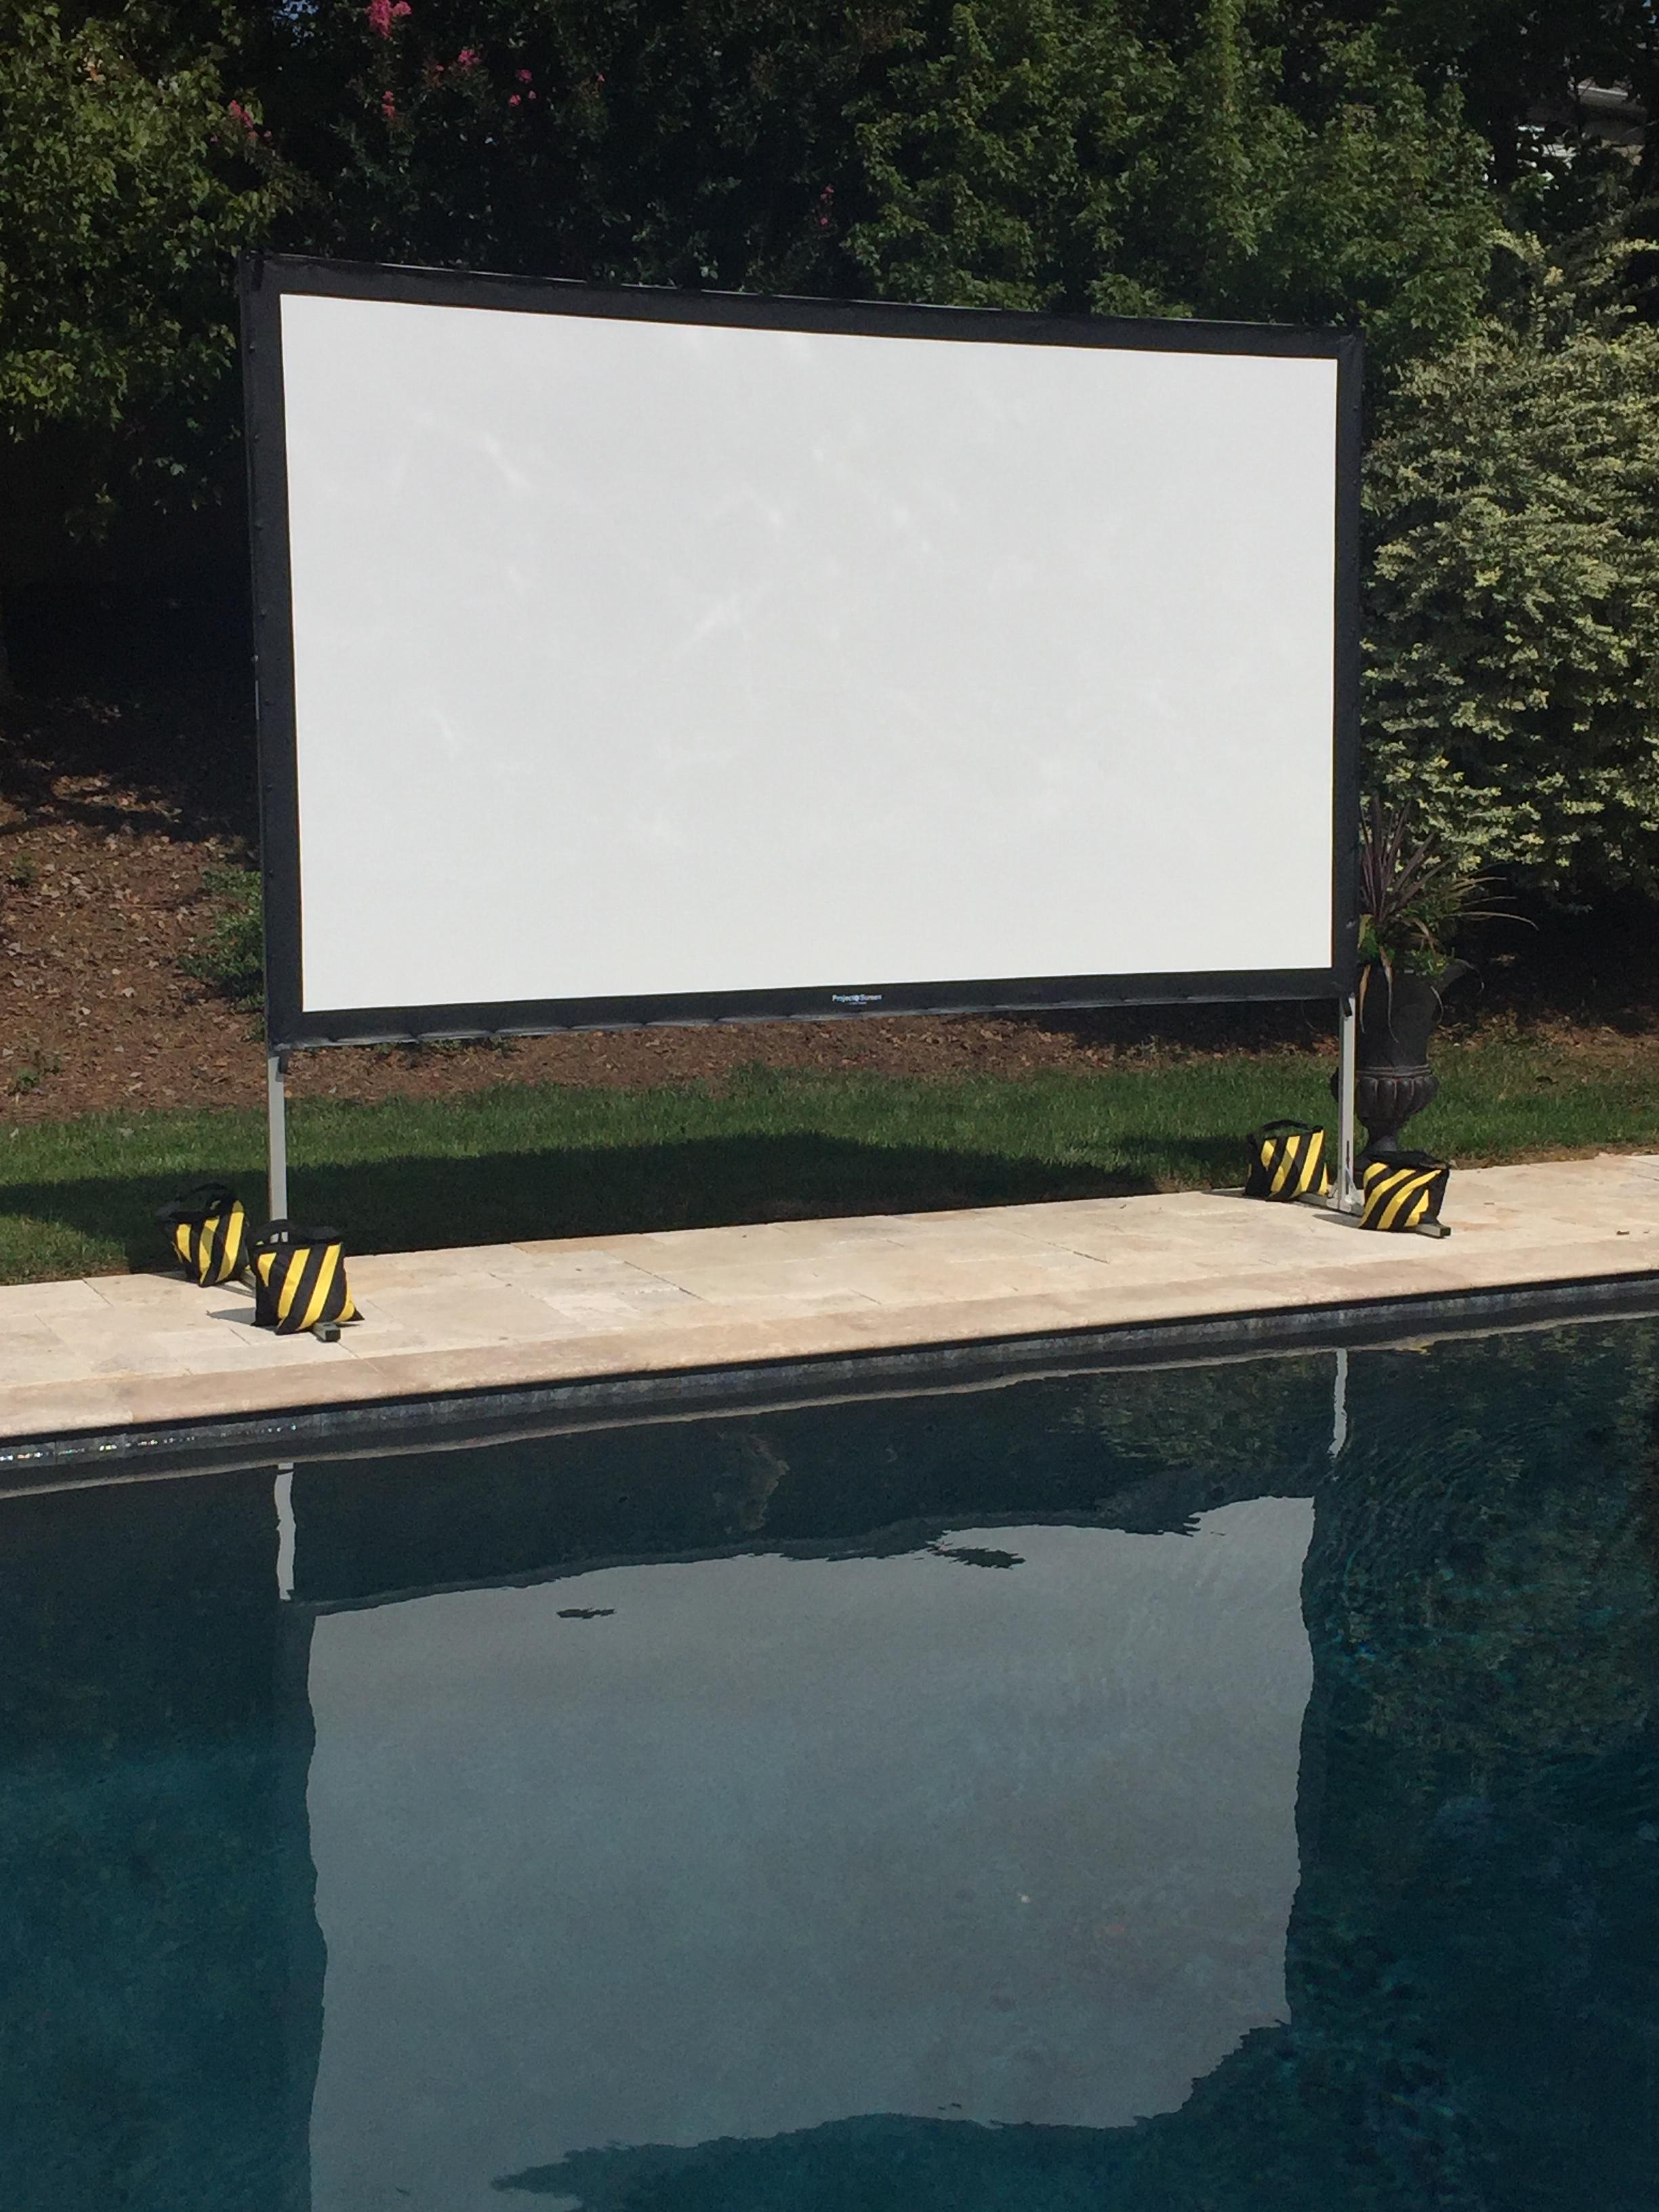 projector screen movie night rental in charlotte nc